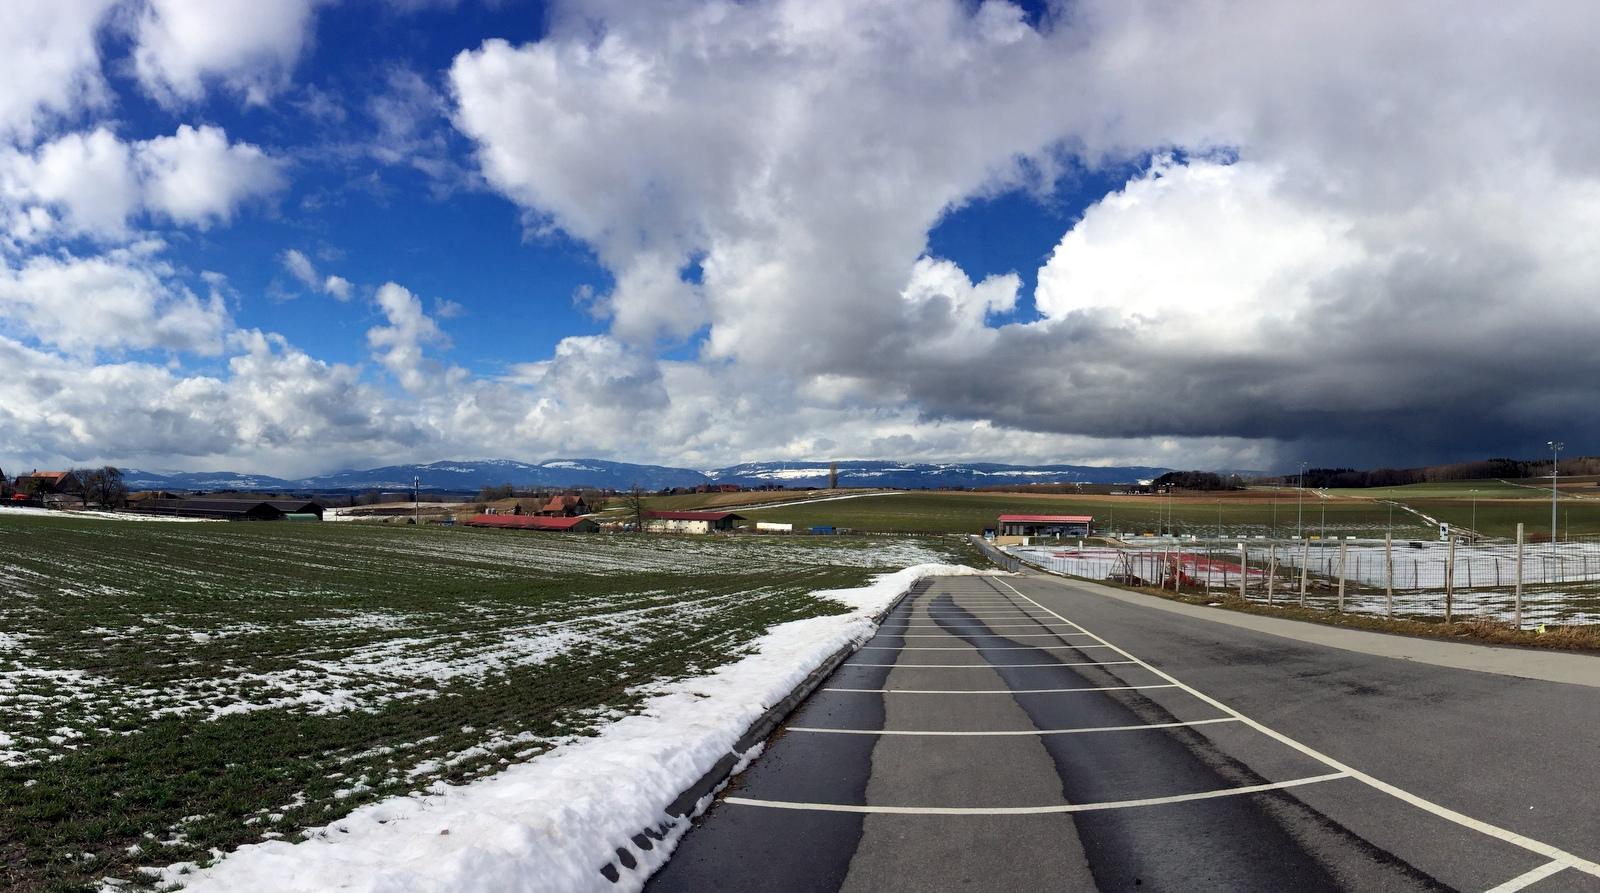 Joli paysage suisse TA CFA MFR Puy-Sec Mars 2018